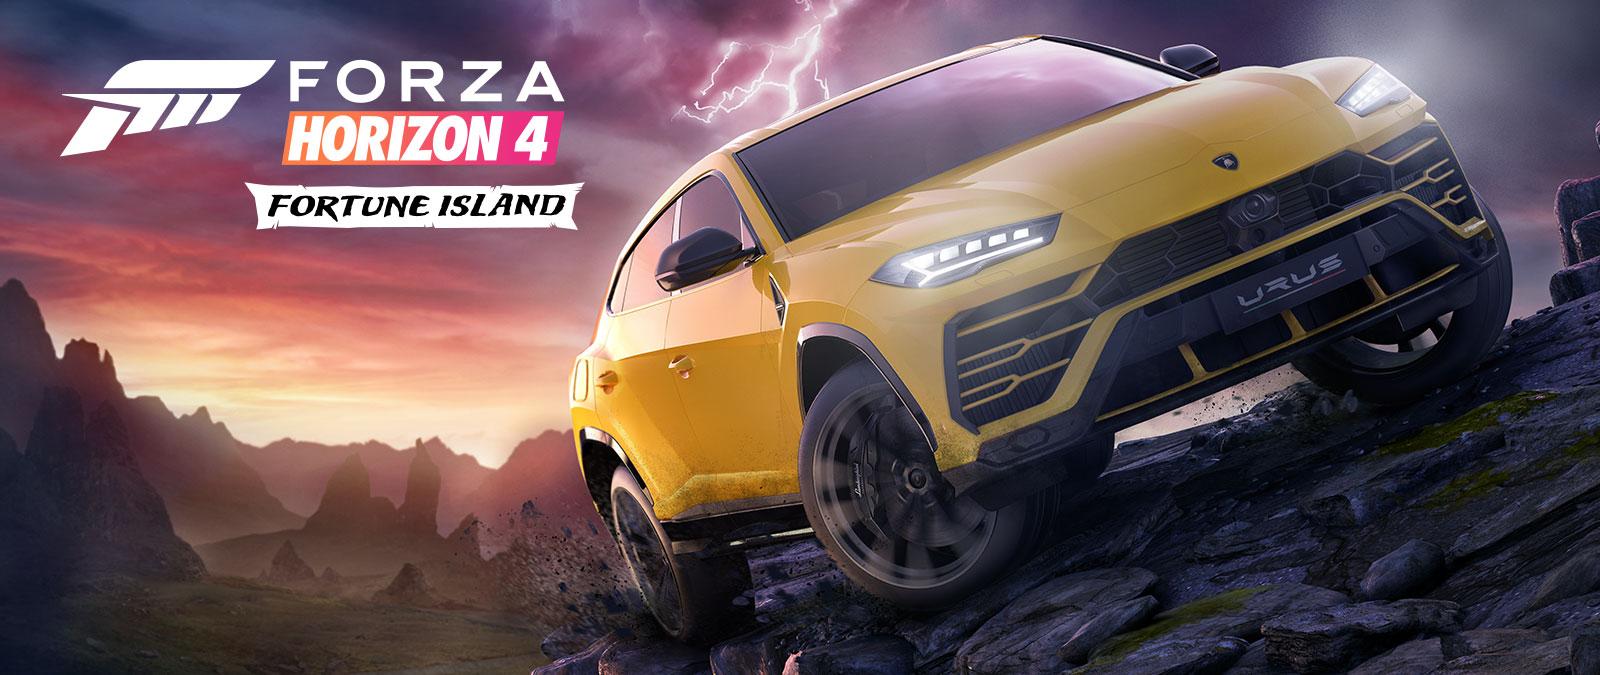 Forza Horizon 4 Fortune Island, un Lamborghini Urus amarillo circula por un terreno complicado con un relámpago de fondo